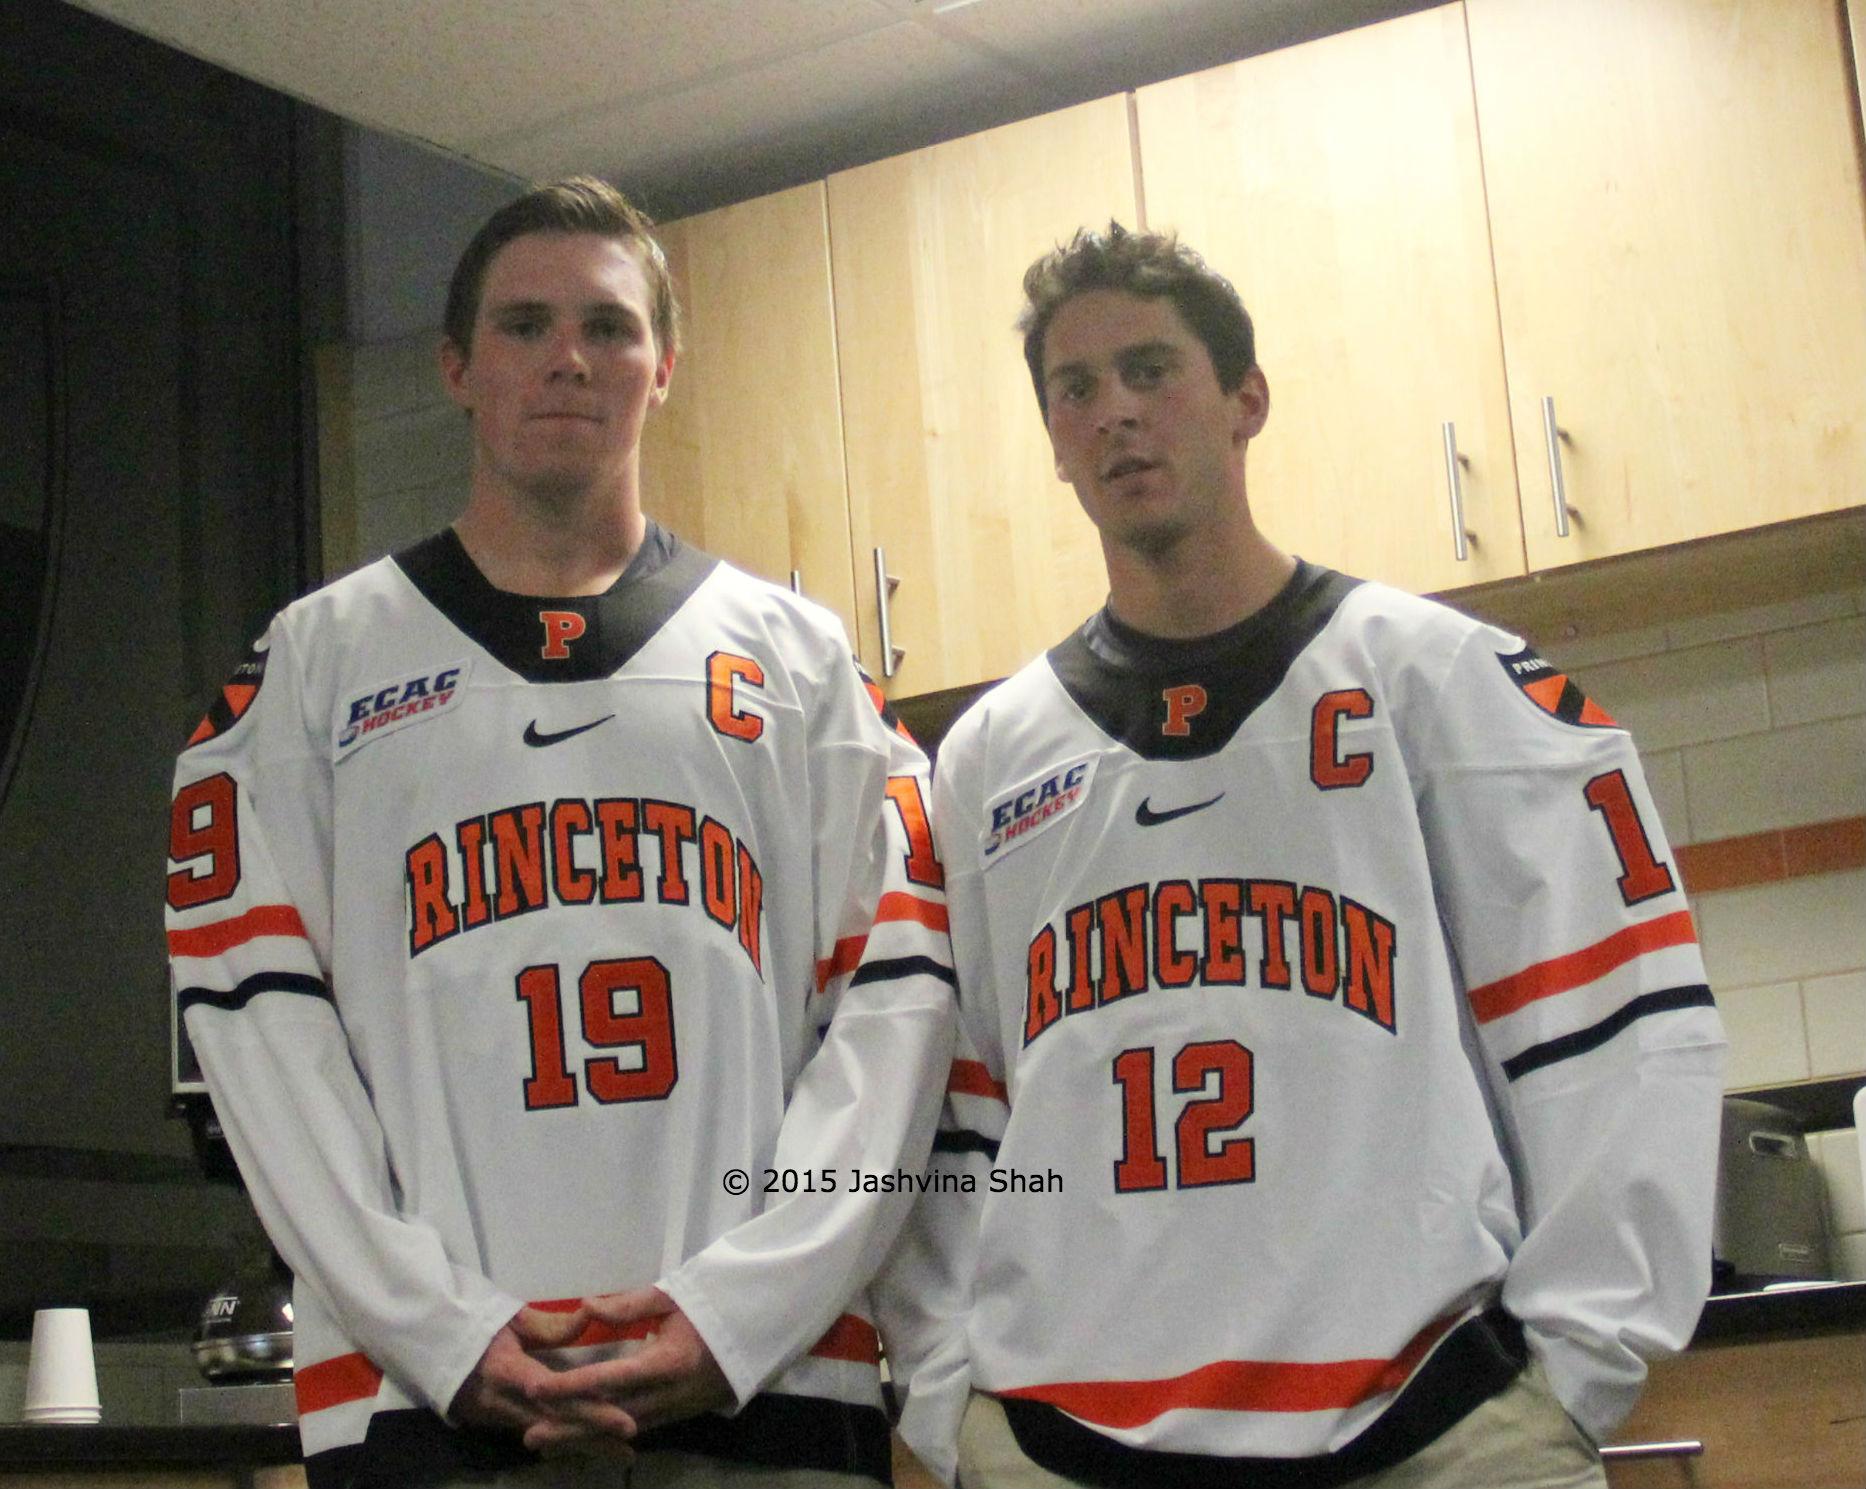 Rebuilding No More - Princeton Is Ready To Strike This Season